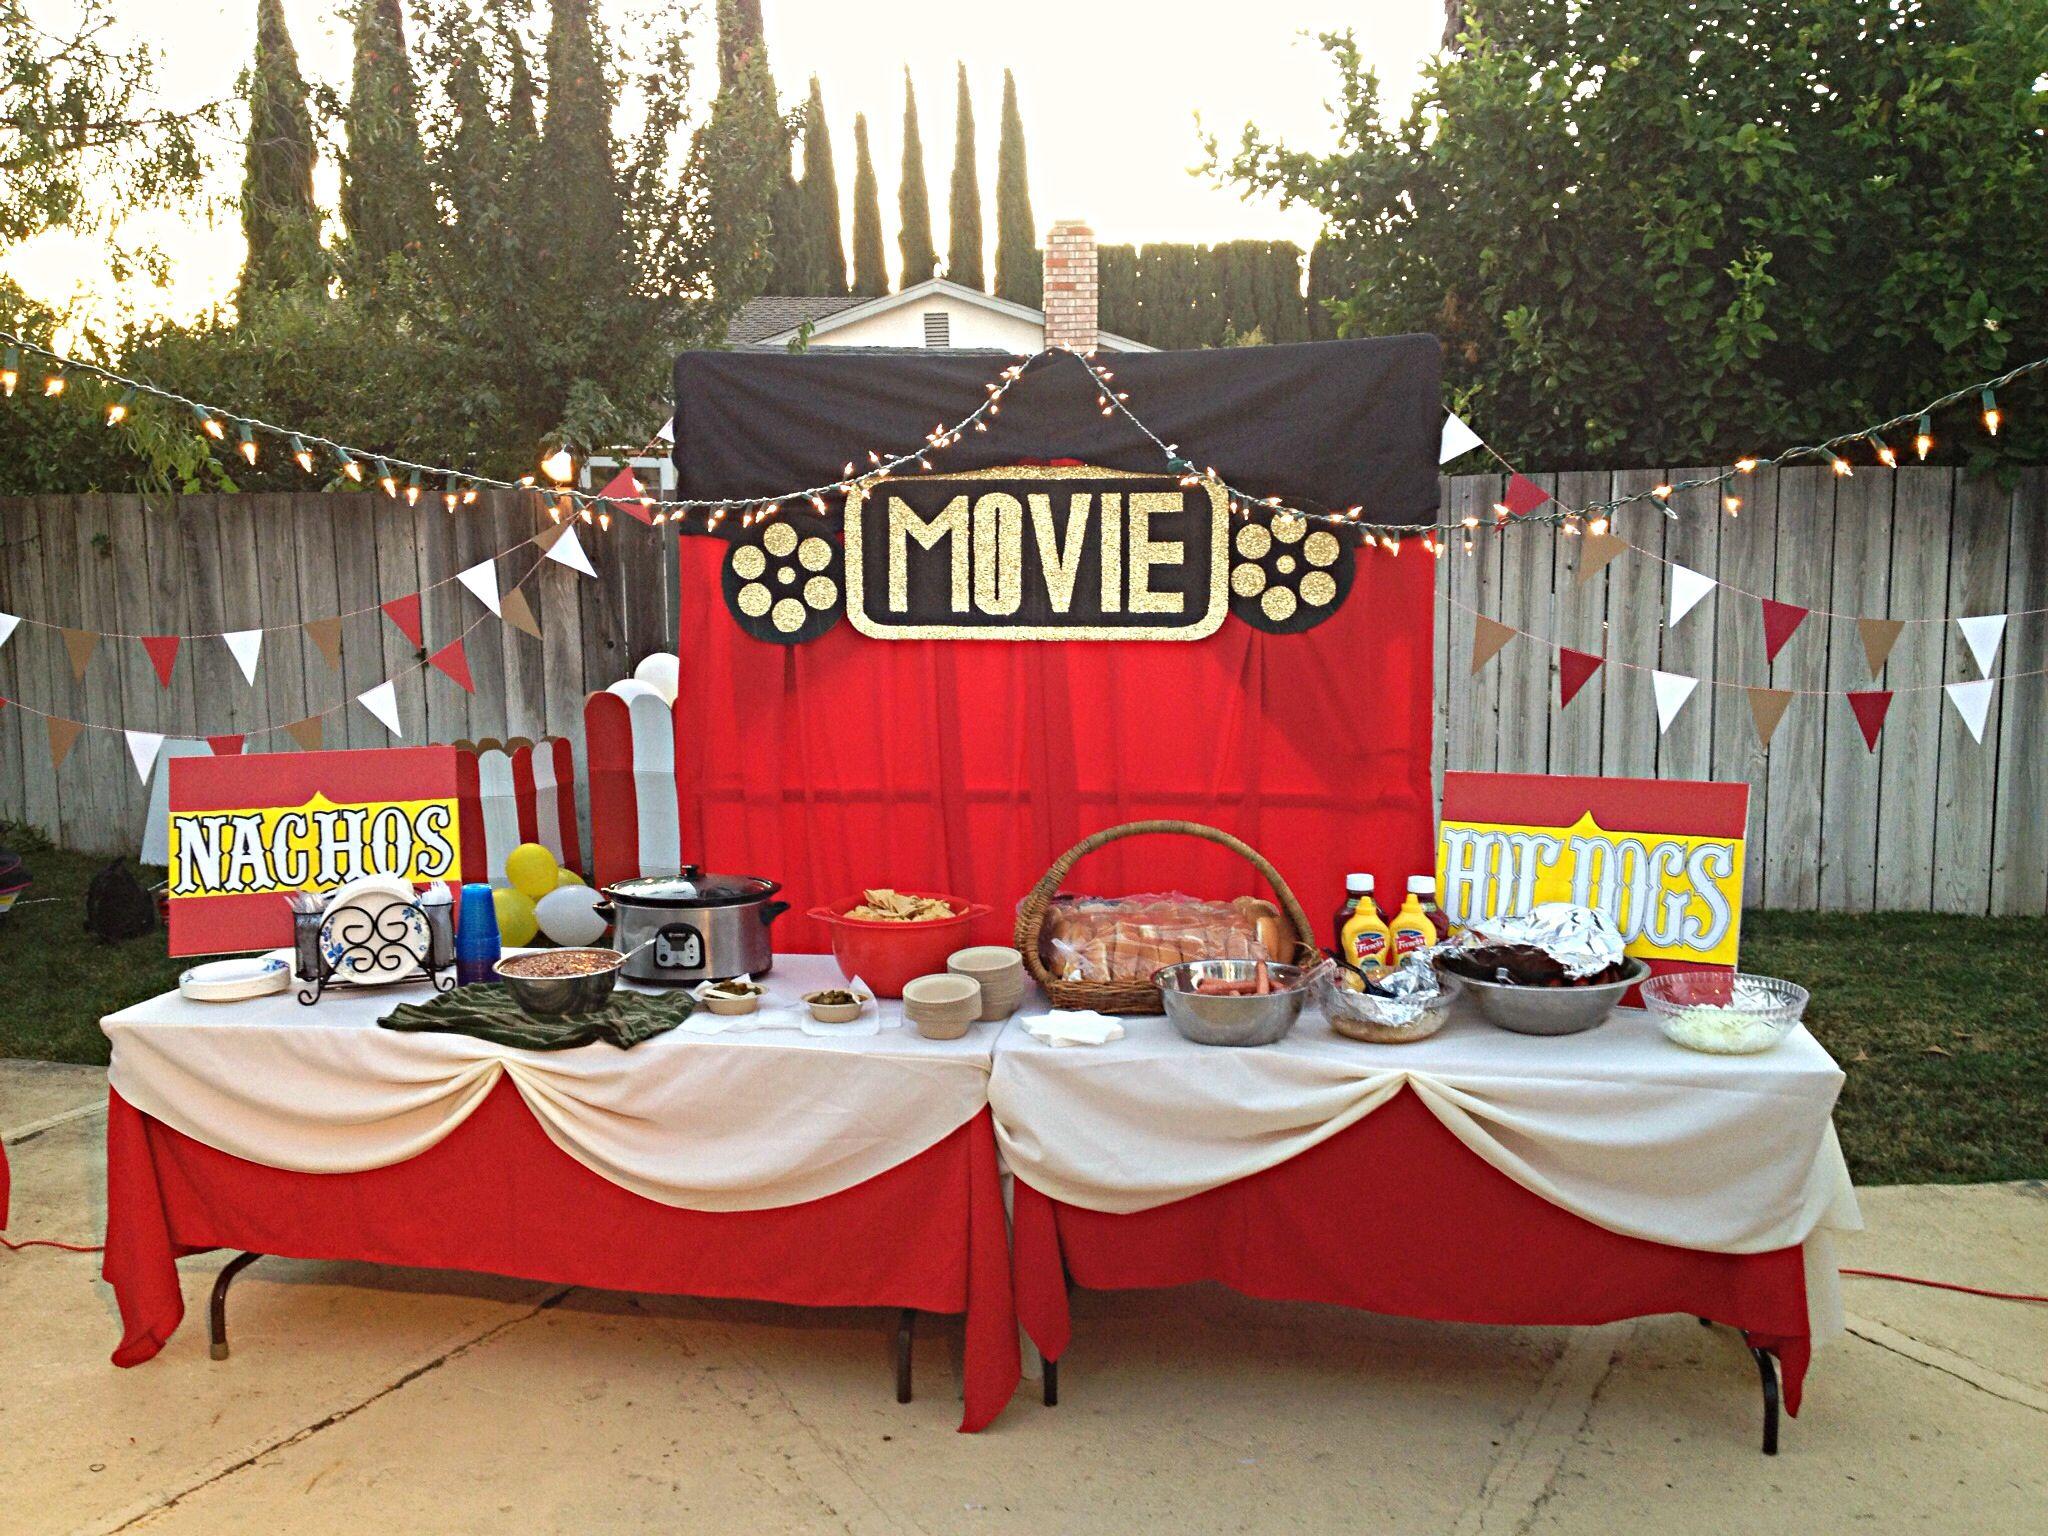 Movie night party ideas my decor pinterest geburtstag - Dekoration kino ...